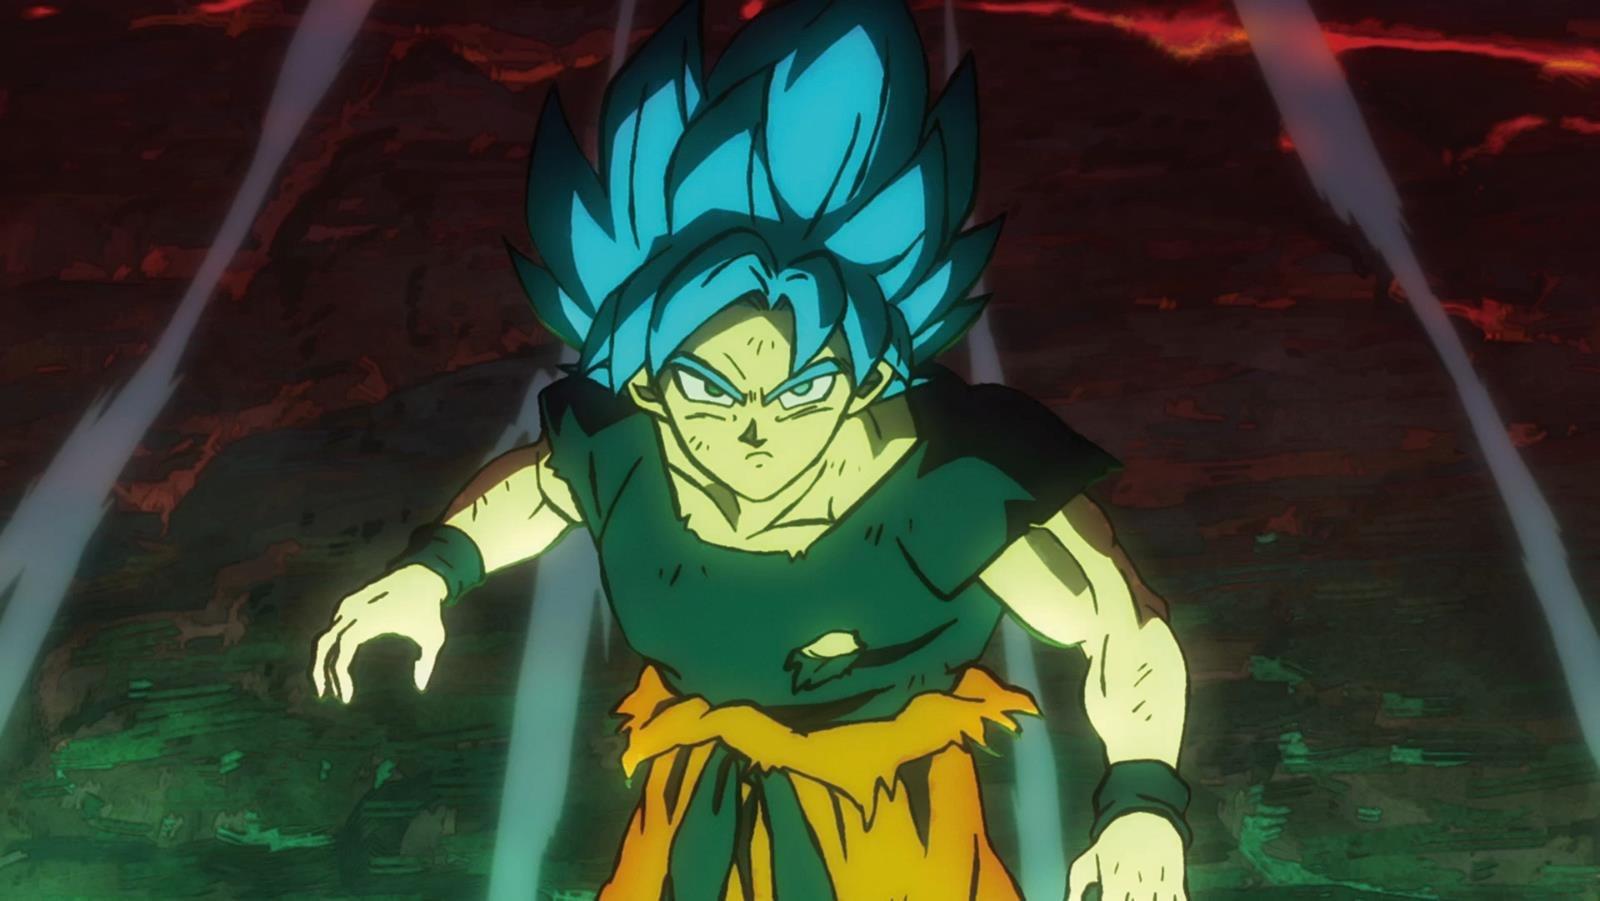 Dragon Ball Super Broly Goes Super Saiyan With 1 U S Box Office